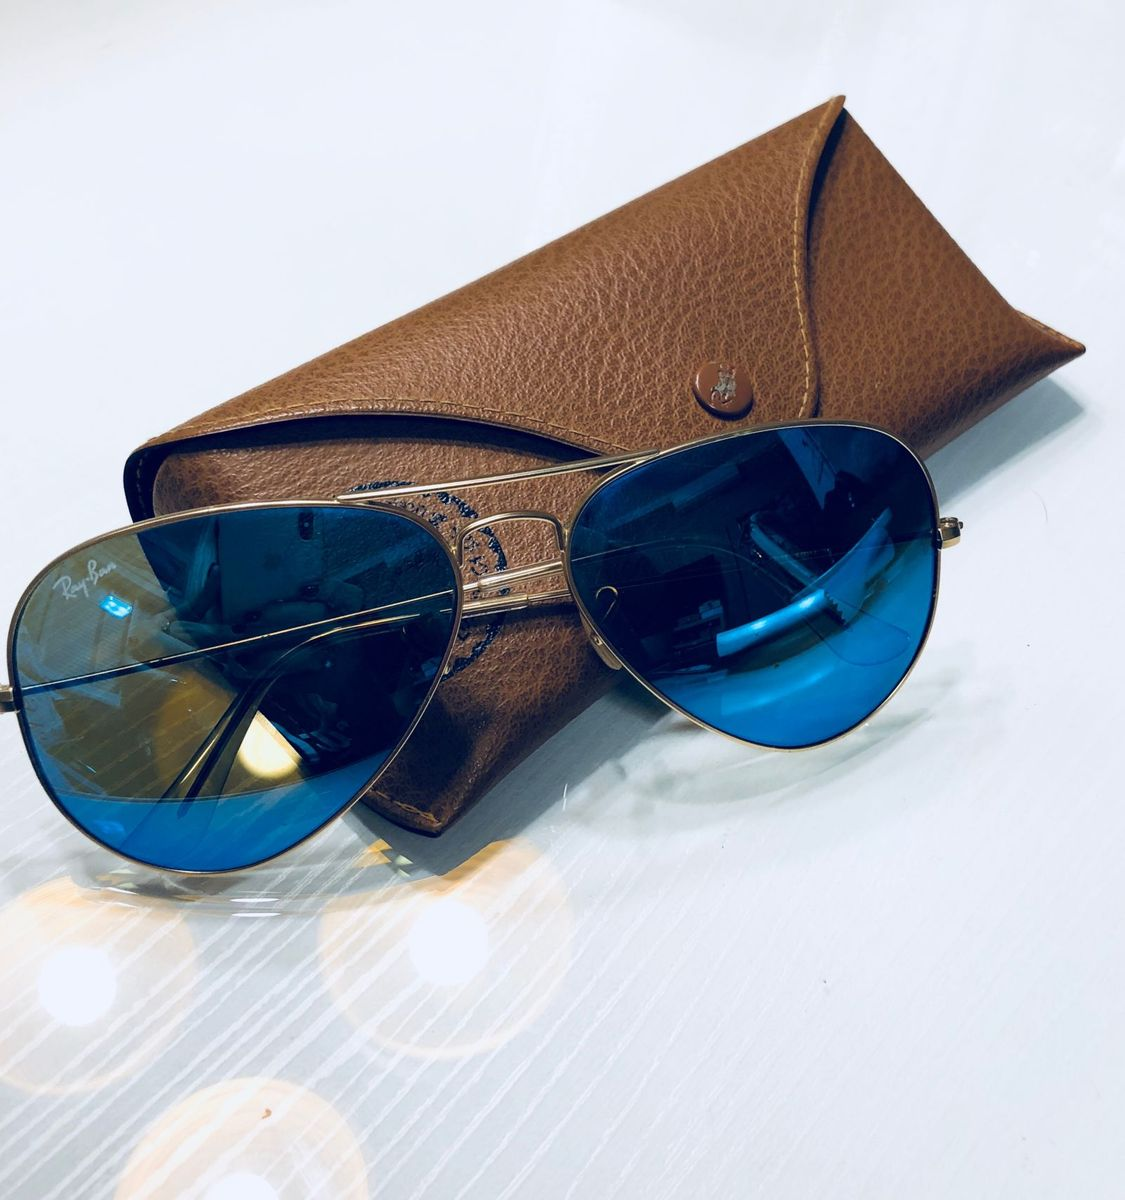 rayban aviador - óculos ray-ban.  Czm6ly9wag90b3muzw5qb2vplmnvbs5ici9wcm9kdwn0cy8xmju5mtivmdq5mzg3mty1nti2zwi0mmzlyme1yzlkotg1yzm1zweuanbn  ... fa92c190d1